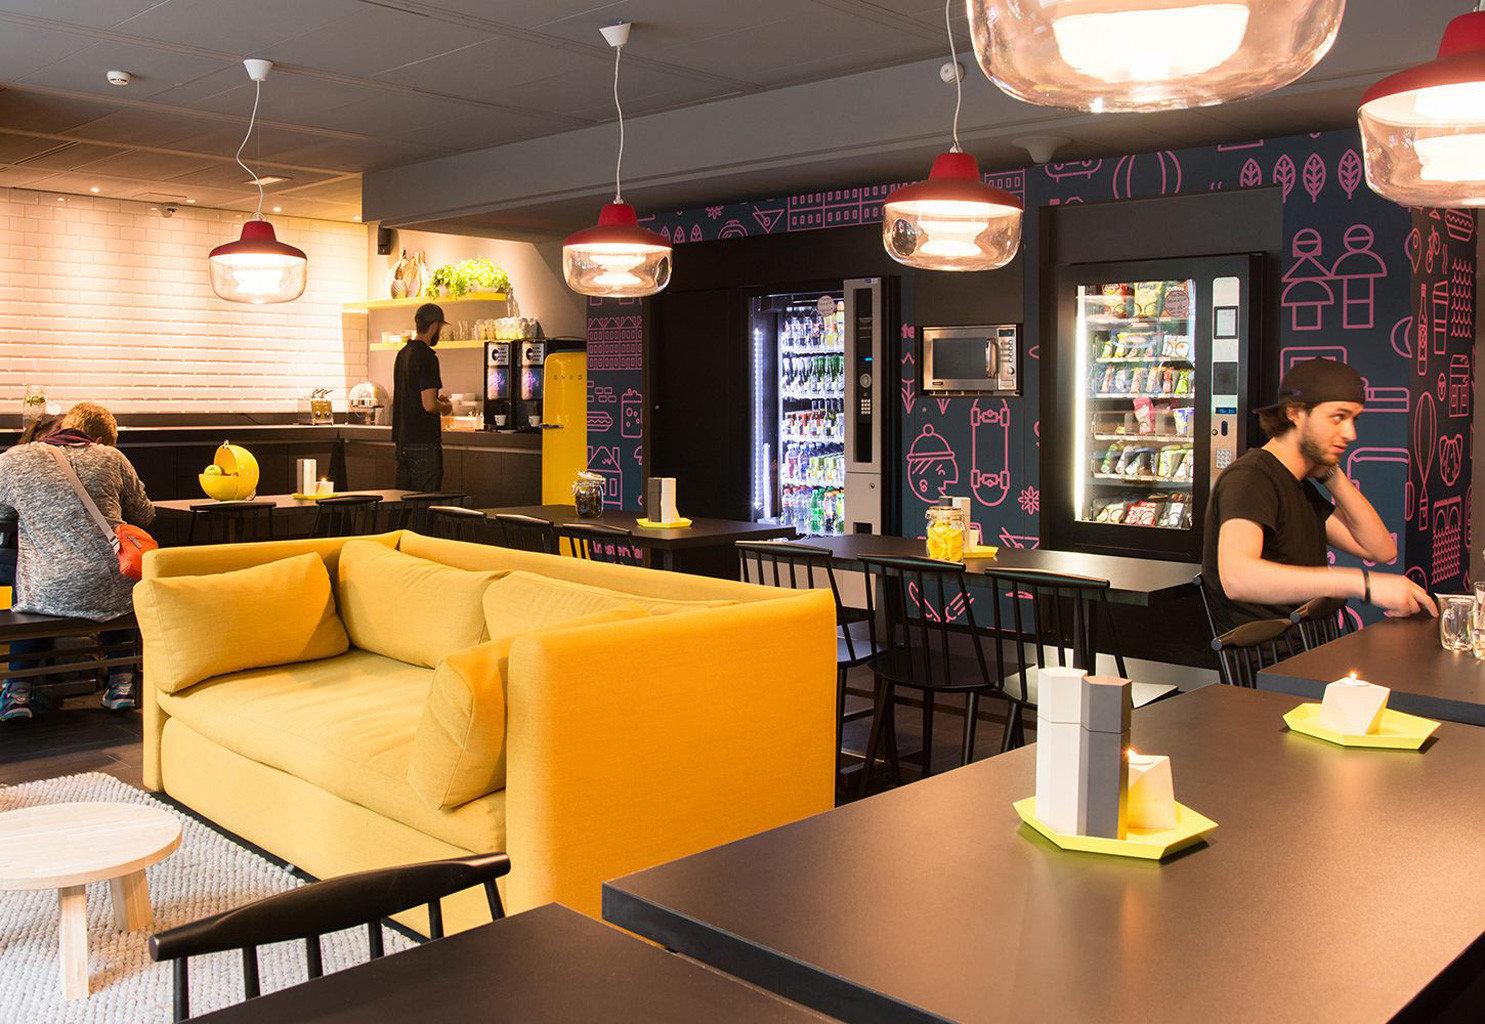 Bar restaurant recreation room café